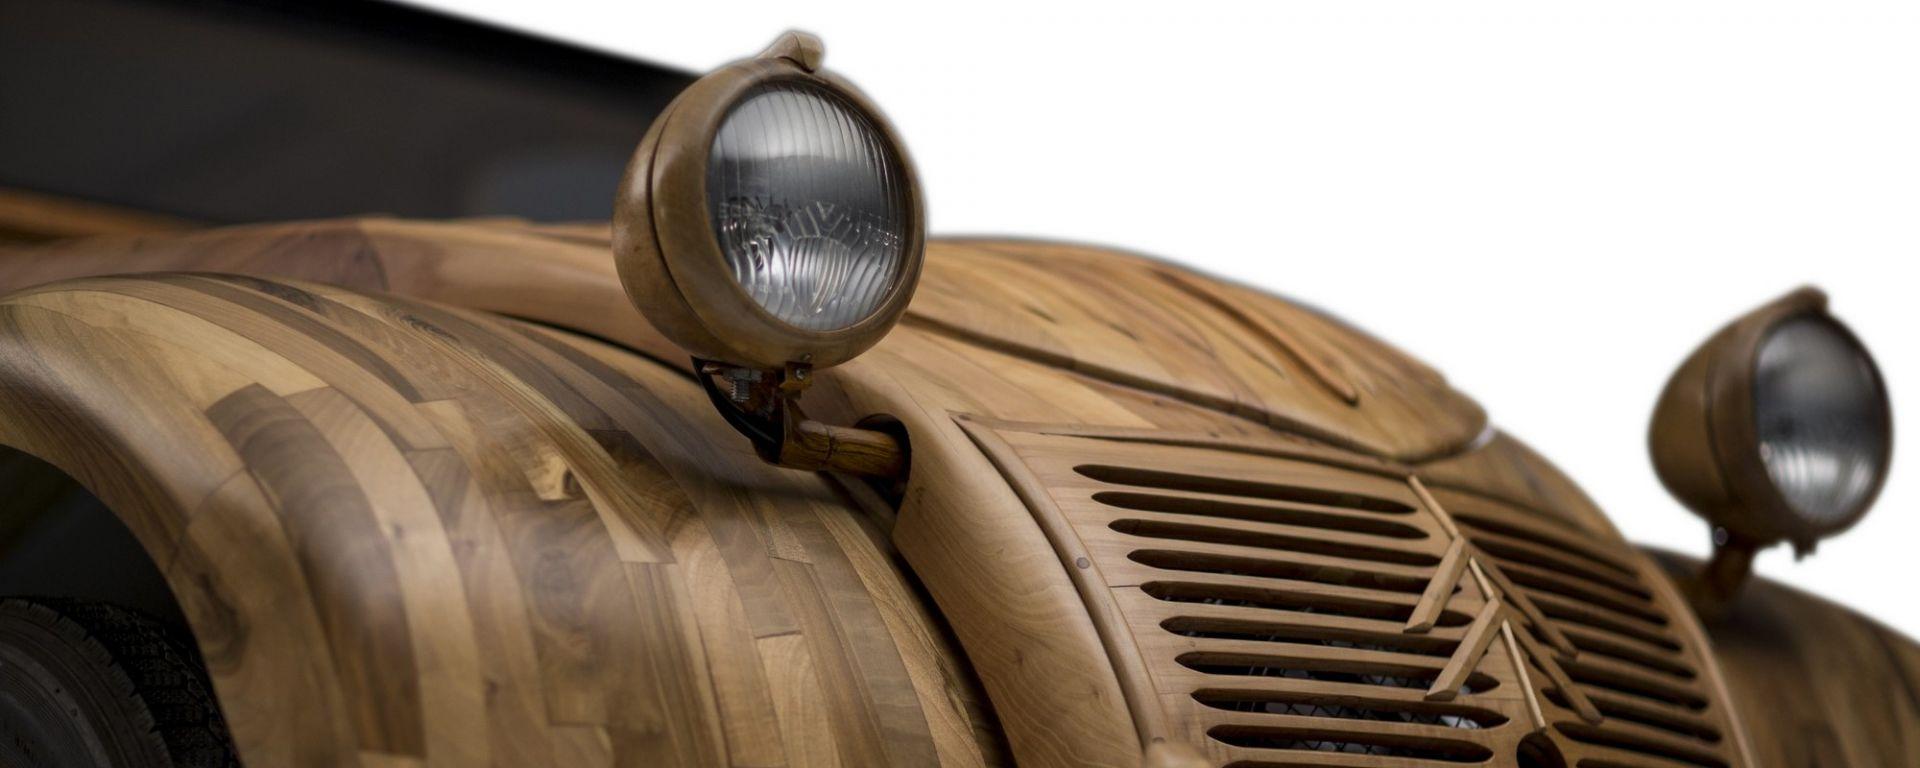 Citroën 2CV di legno by Michel Robillard: i fanali